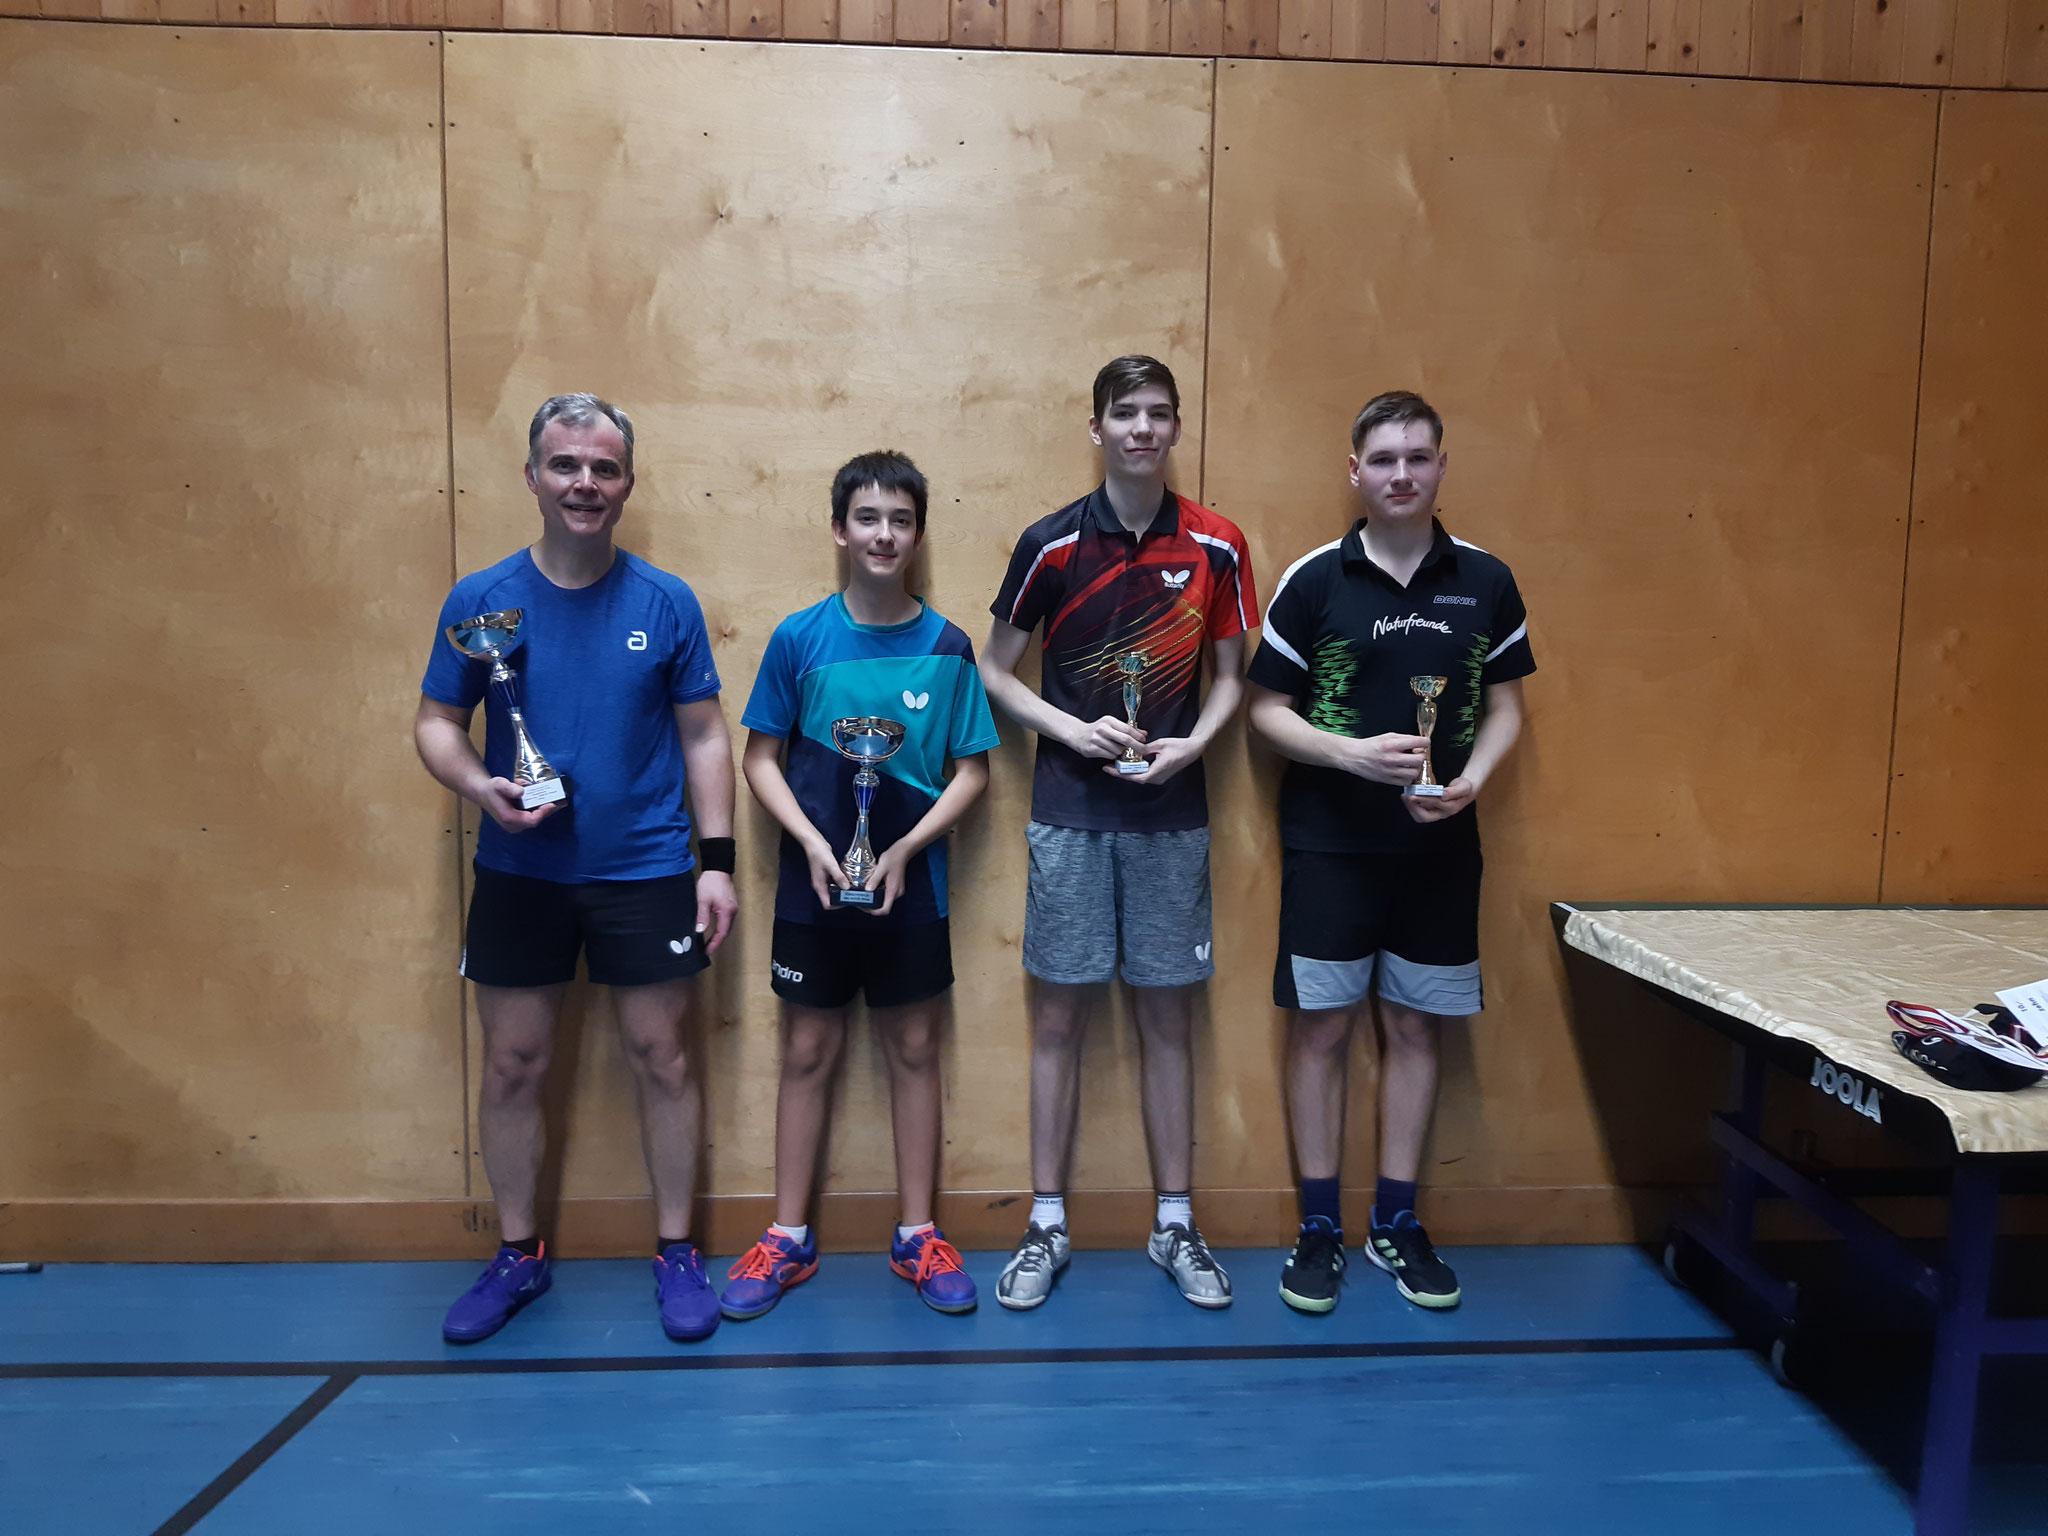 Siegerfoto Bewerb Team: v.l.n.r. Robert Jandl & Niklas Damm (beide SSTO) (Sieger), Lukas Baumgartner & Alexander Cvetkovic (LENZ & NFS) (Platz 2)